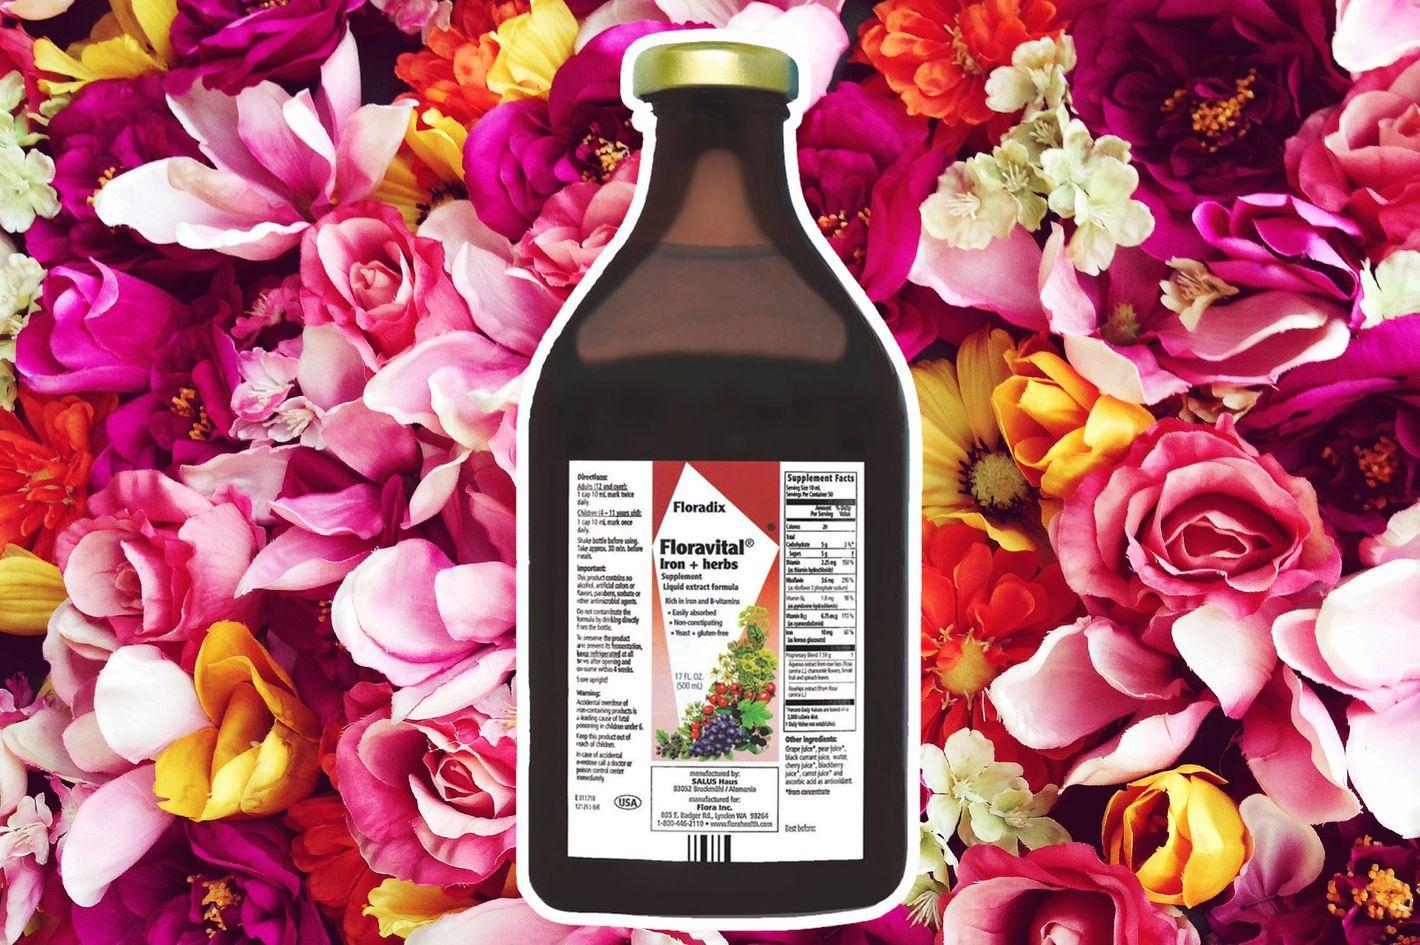 Floravital Iron & Herbs Yeast Free Flora Inc 17 oz Liquid